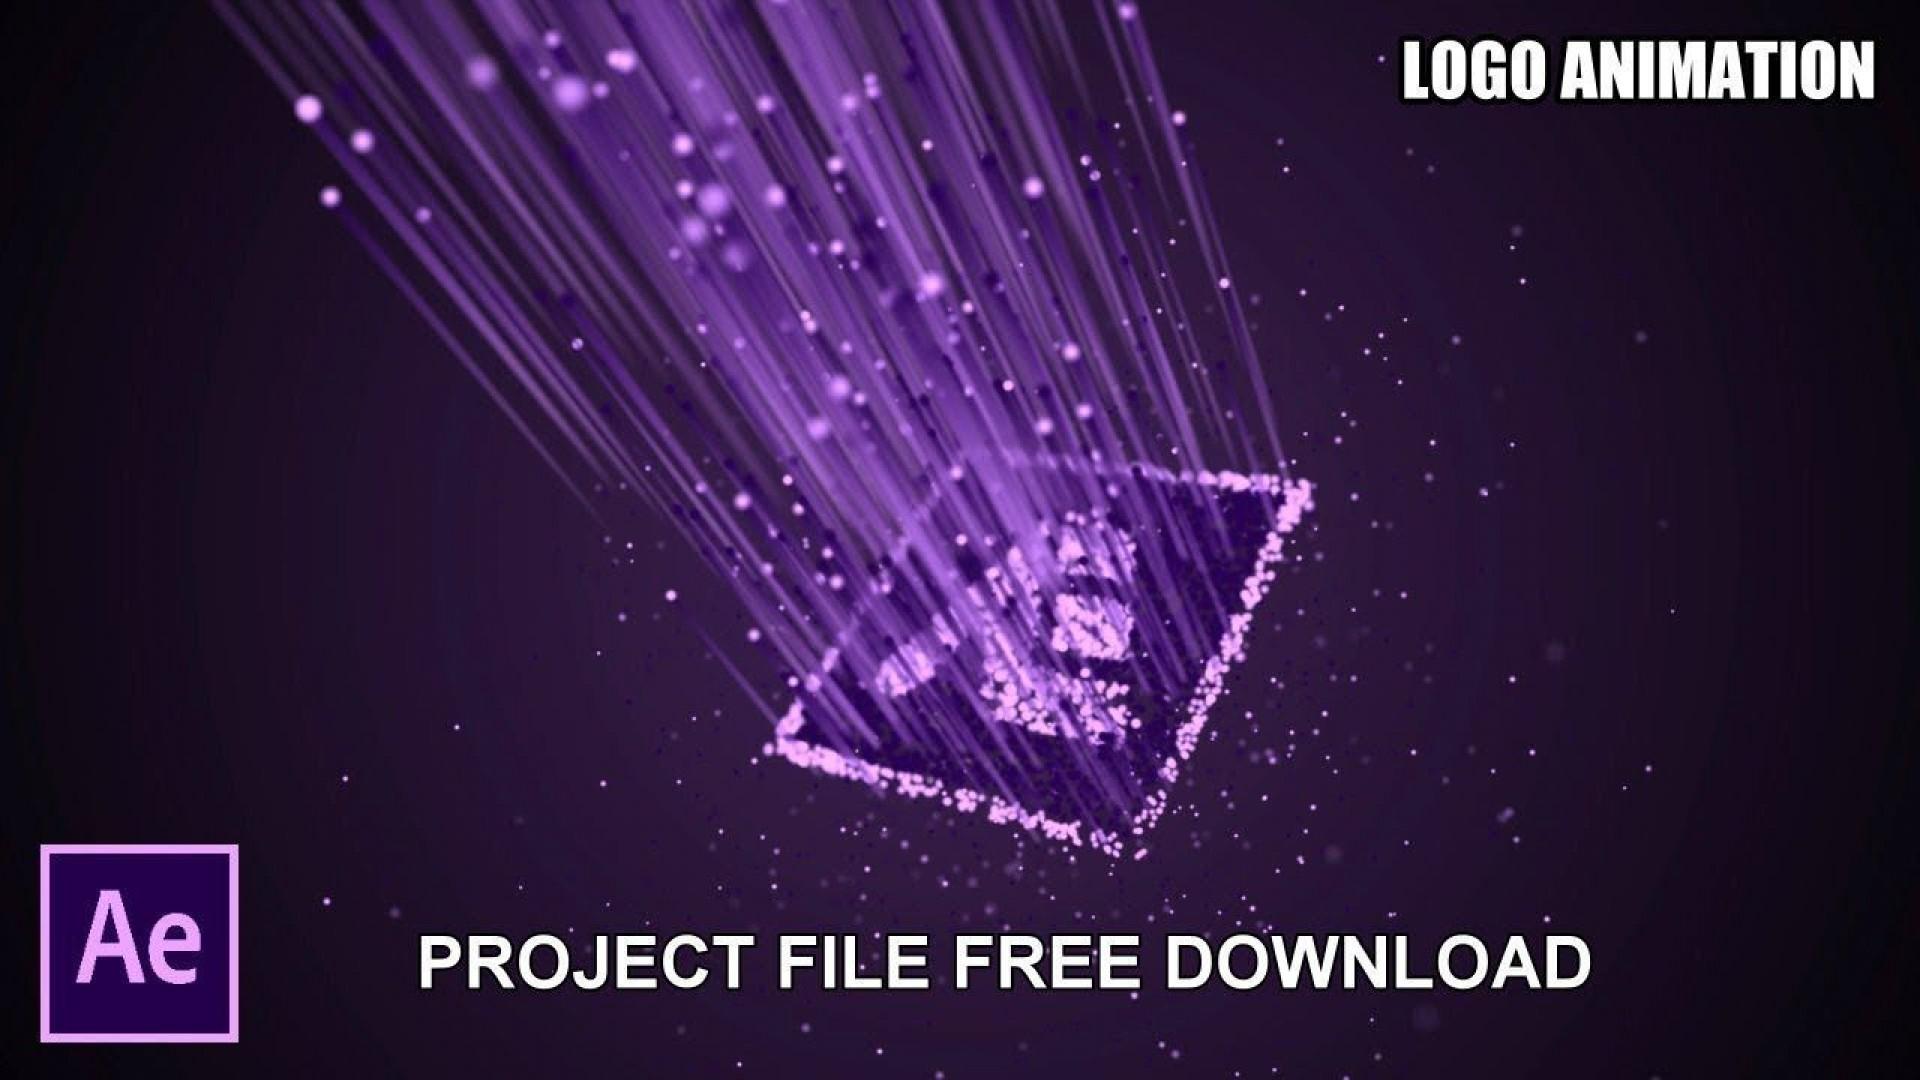 004 Wonderful Adobe After Effect Logo Template Free Download Concept  Cs6 Wedding Invitation Cs5 Intro1920